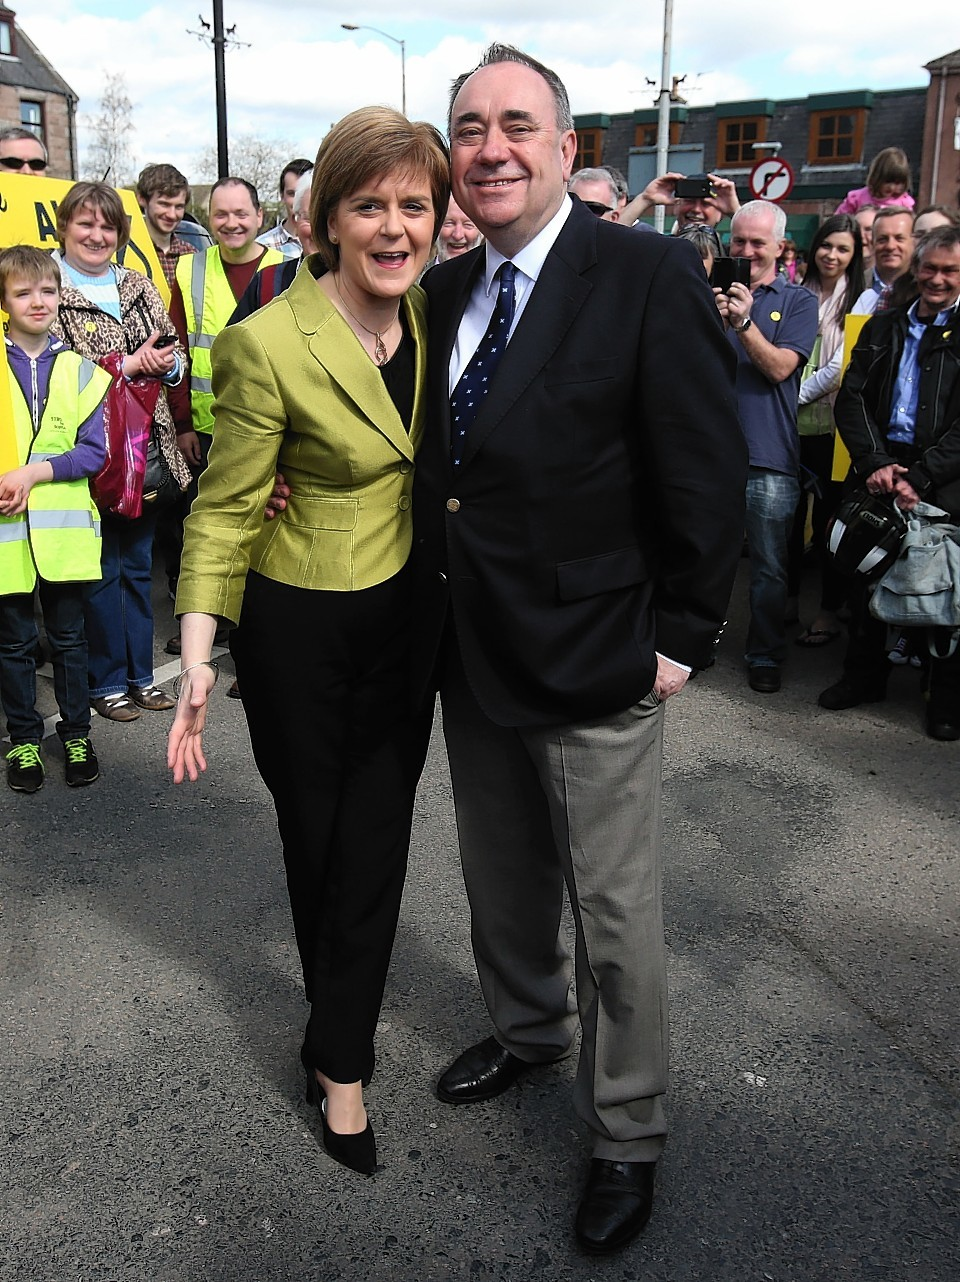 Nicola Sturgeon joins Alex Salmond on campaign trail